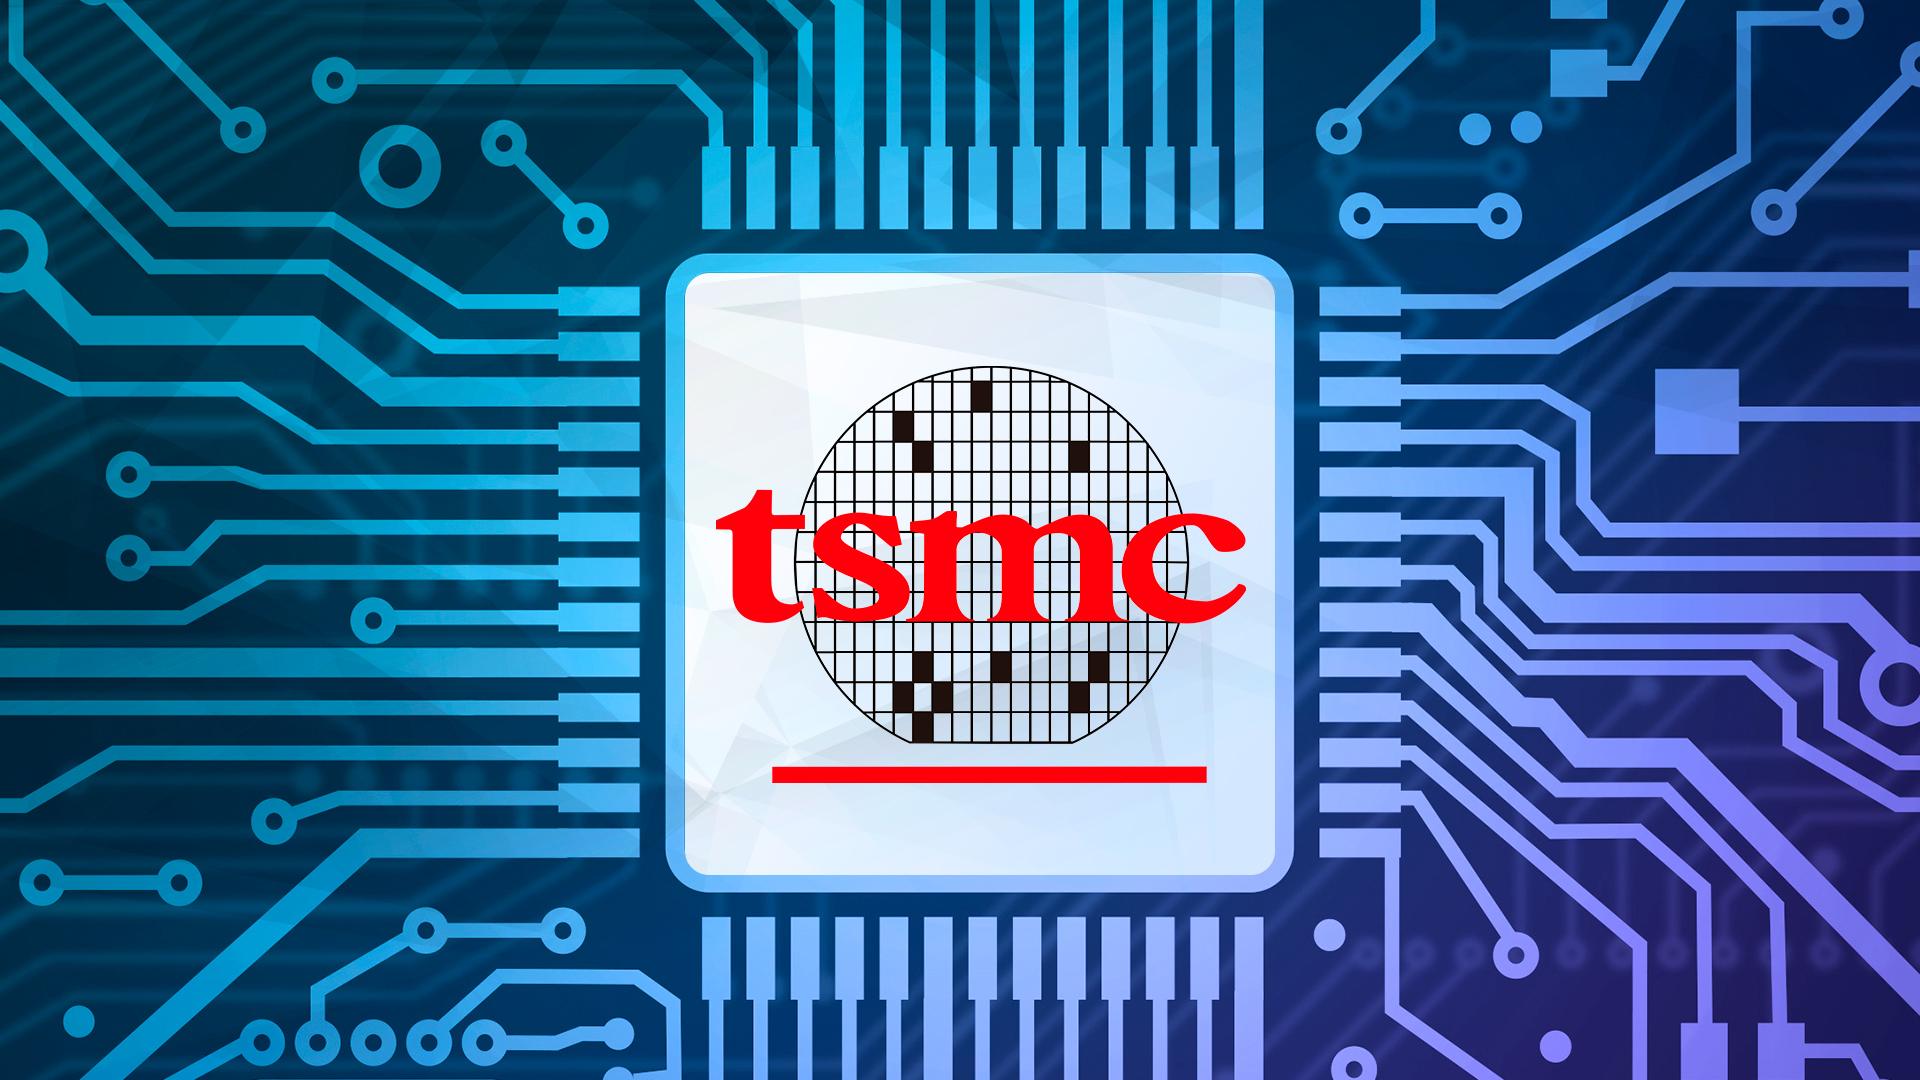 Logo, Chip, Tsmc, Taiwan Semiconductor Manufacturing Company